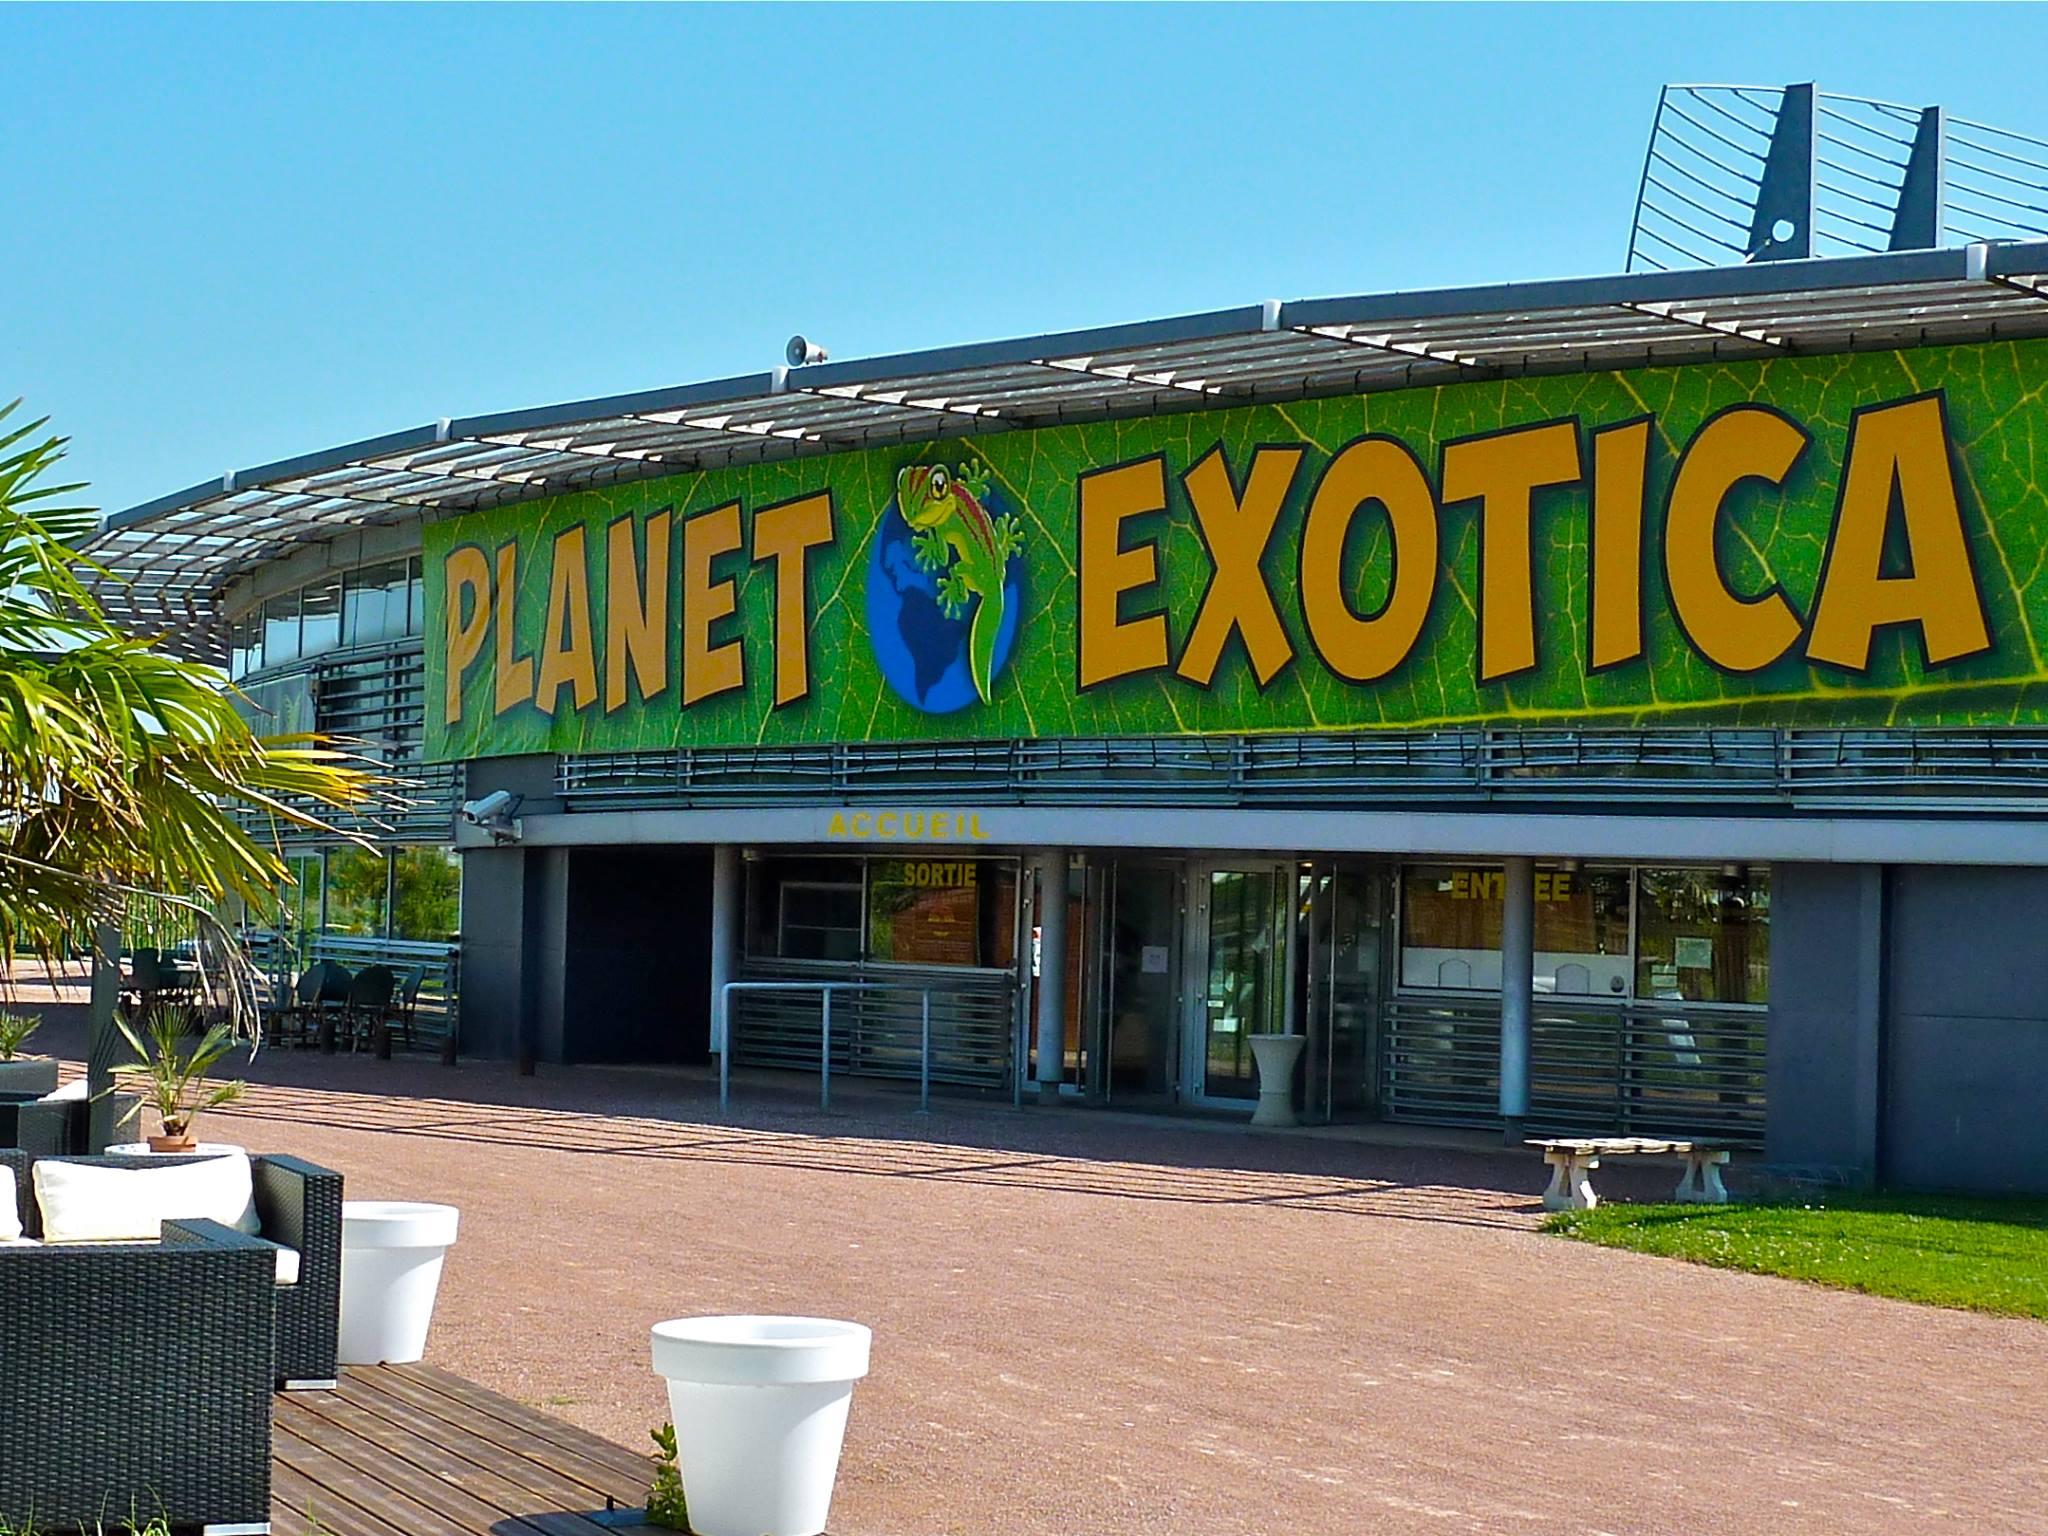 planet-exotica-royan.jpg